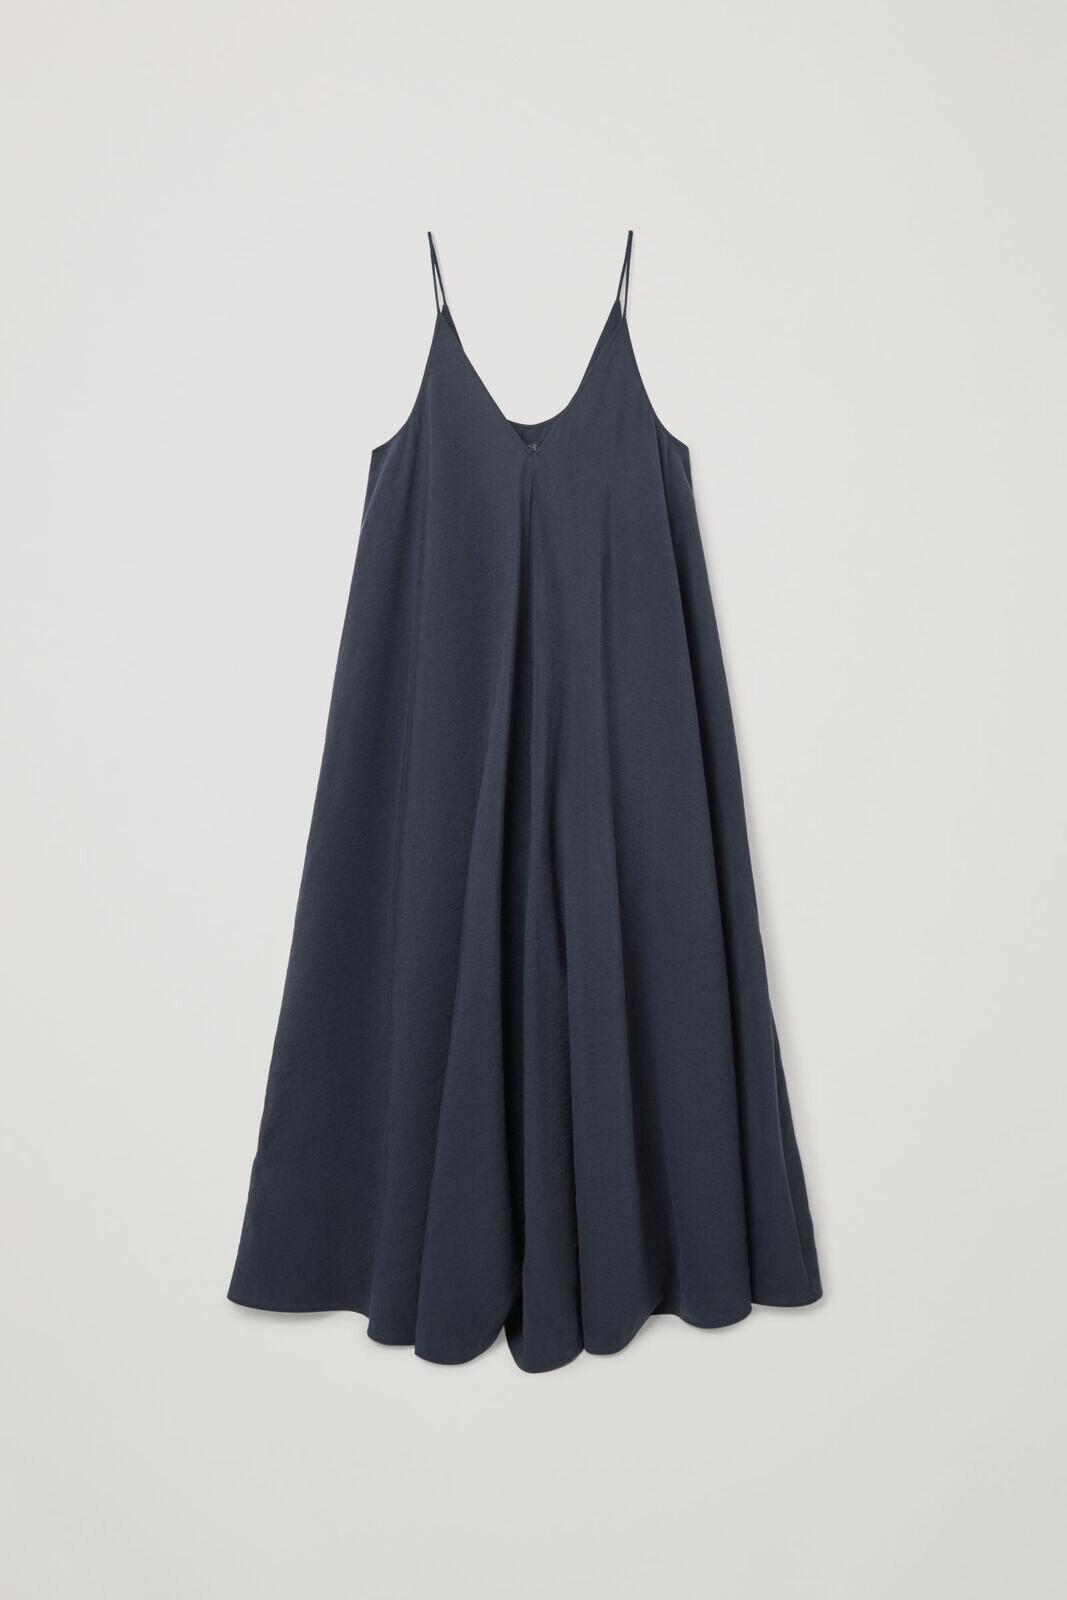 Voluminøs kjole med tynne stropper og v-hals